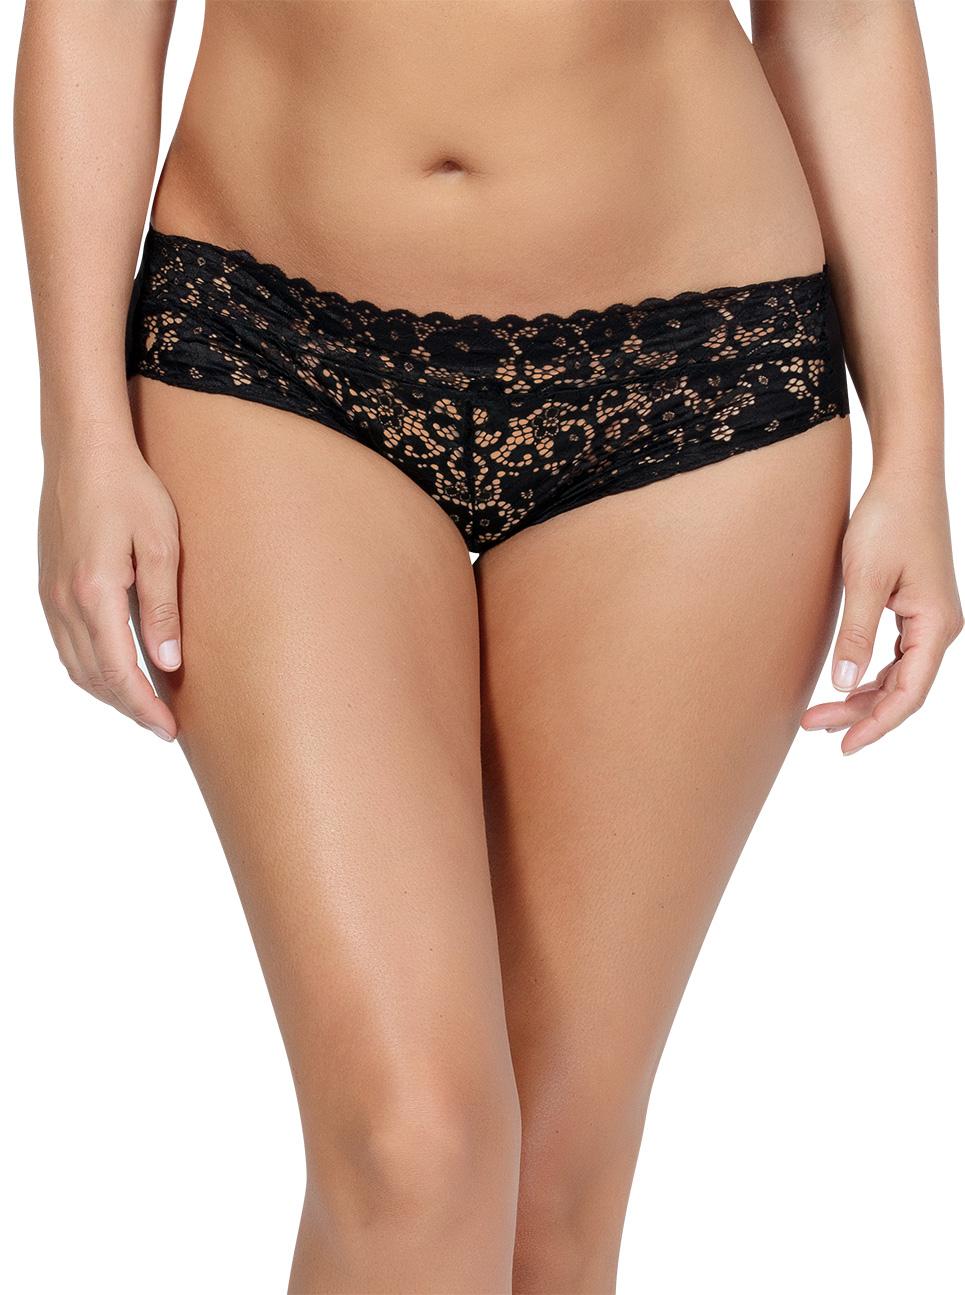 00202c8b1ad12a Adriana Bikini - Black - P5483 - ParfaitLingerie.com